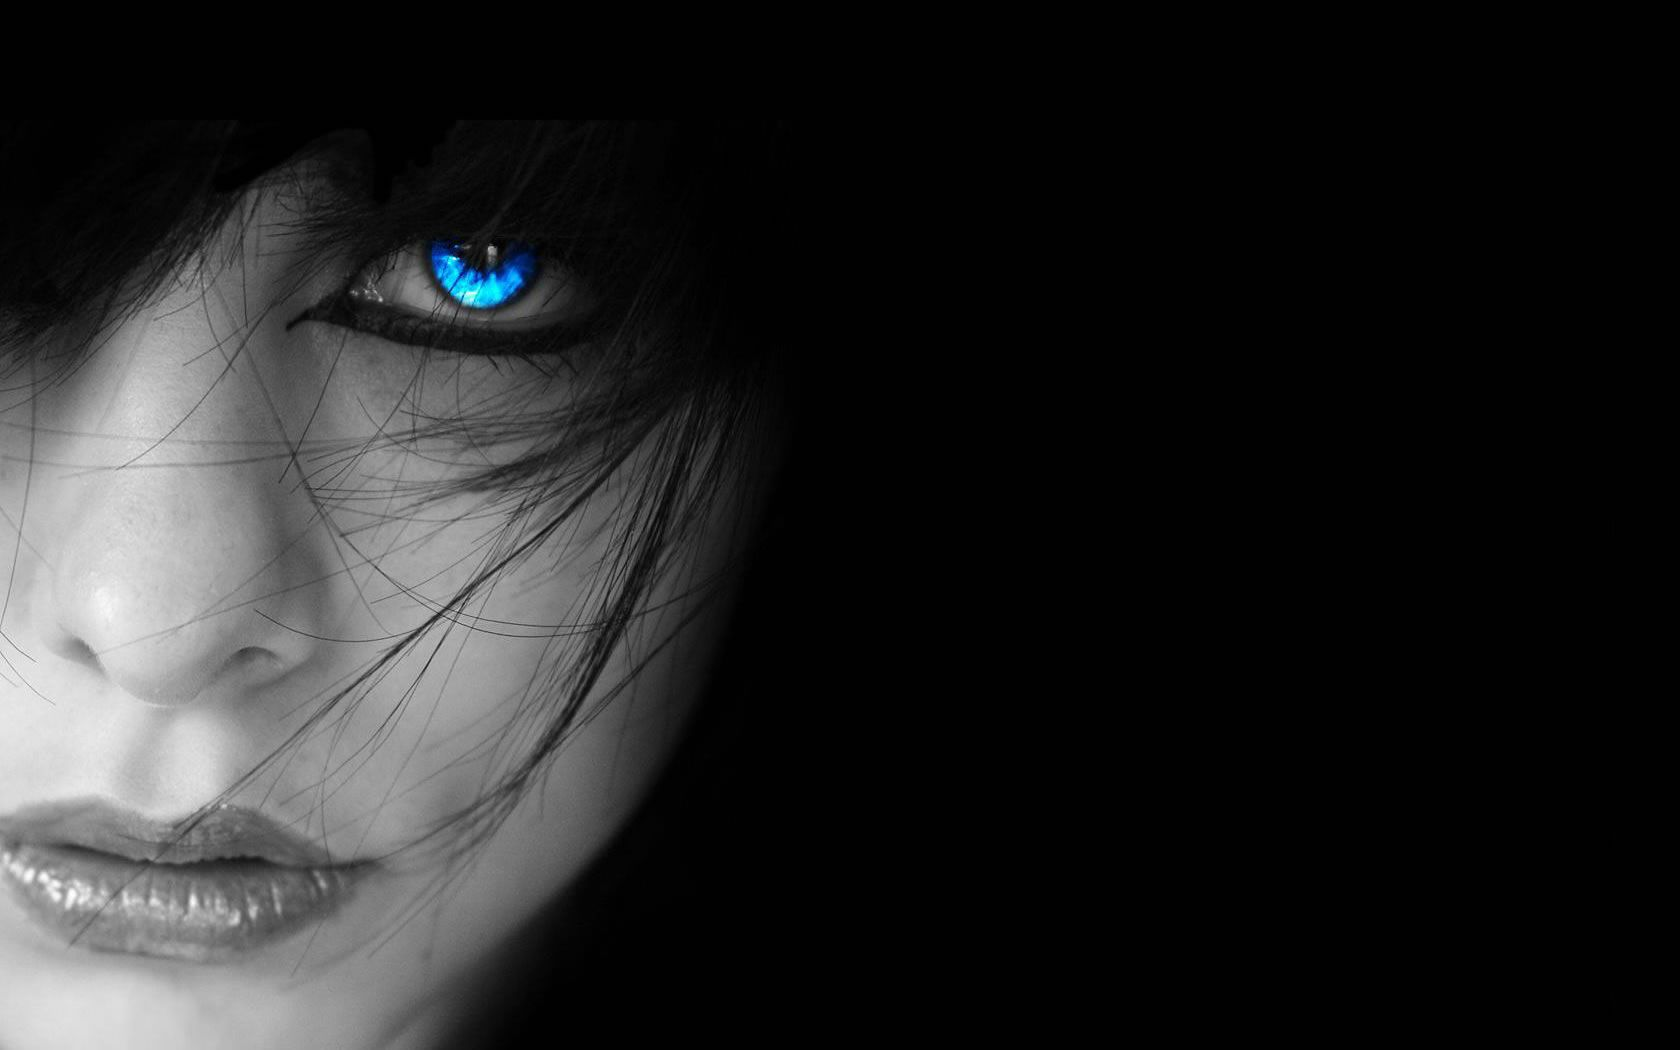 Girl With Blue Eyes At Night Wallpaper Free Free Beautiful Girl Eyes Wallpaper Beautiful Eyes Images Beautiful Eyes